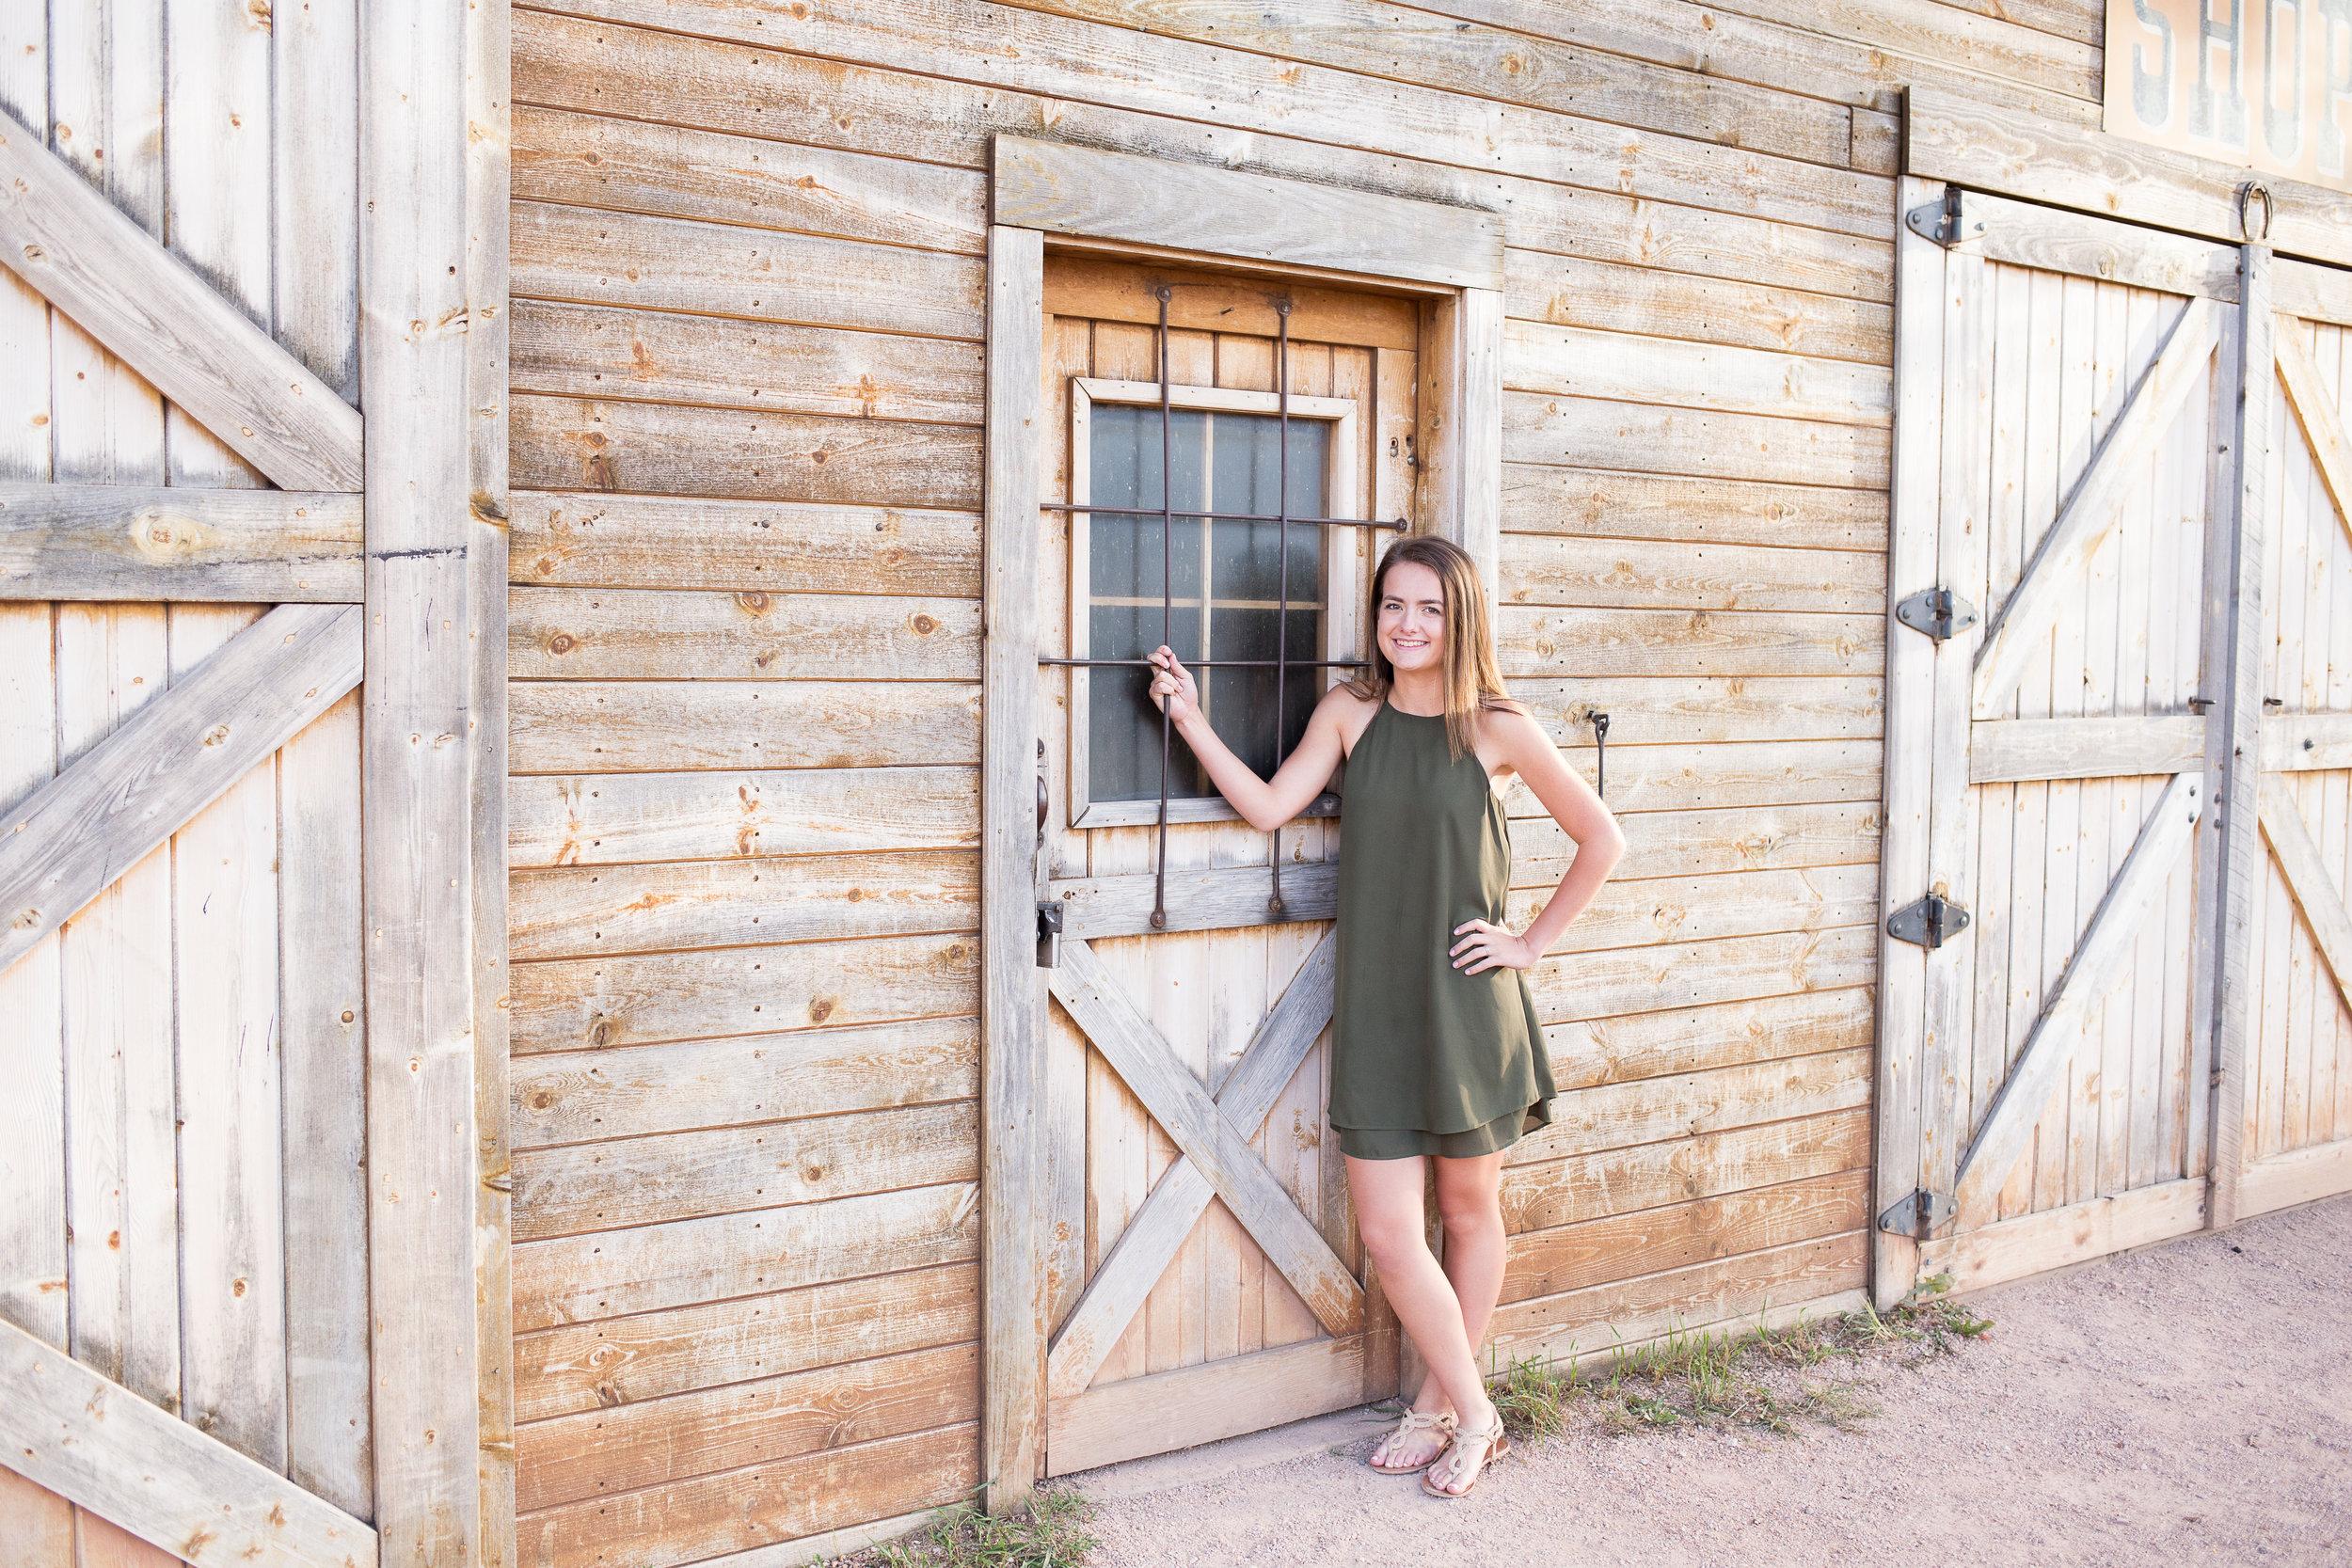 Rampart High School senior leaning against barn door for her Colorado Springs Senior session at Rock  Ledge  Ranch | Stacy Carosa Photography  Denver Senior Photographer